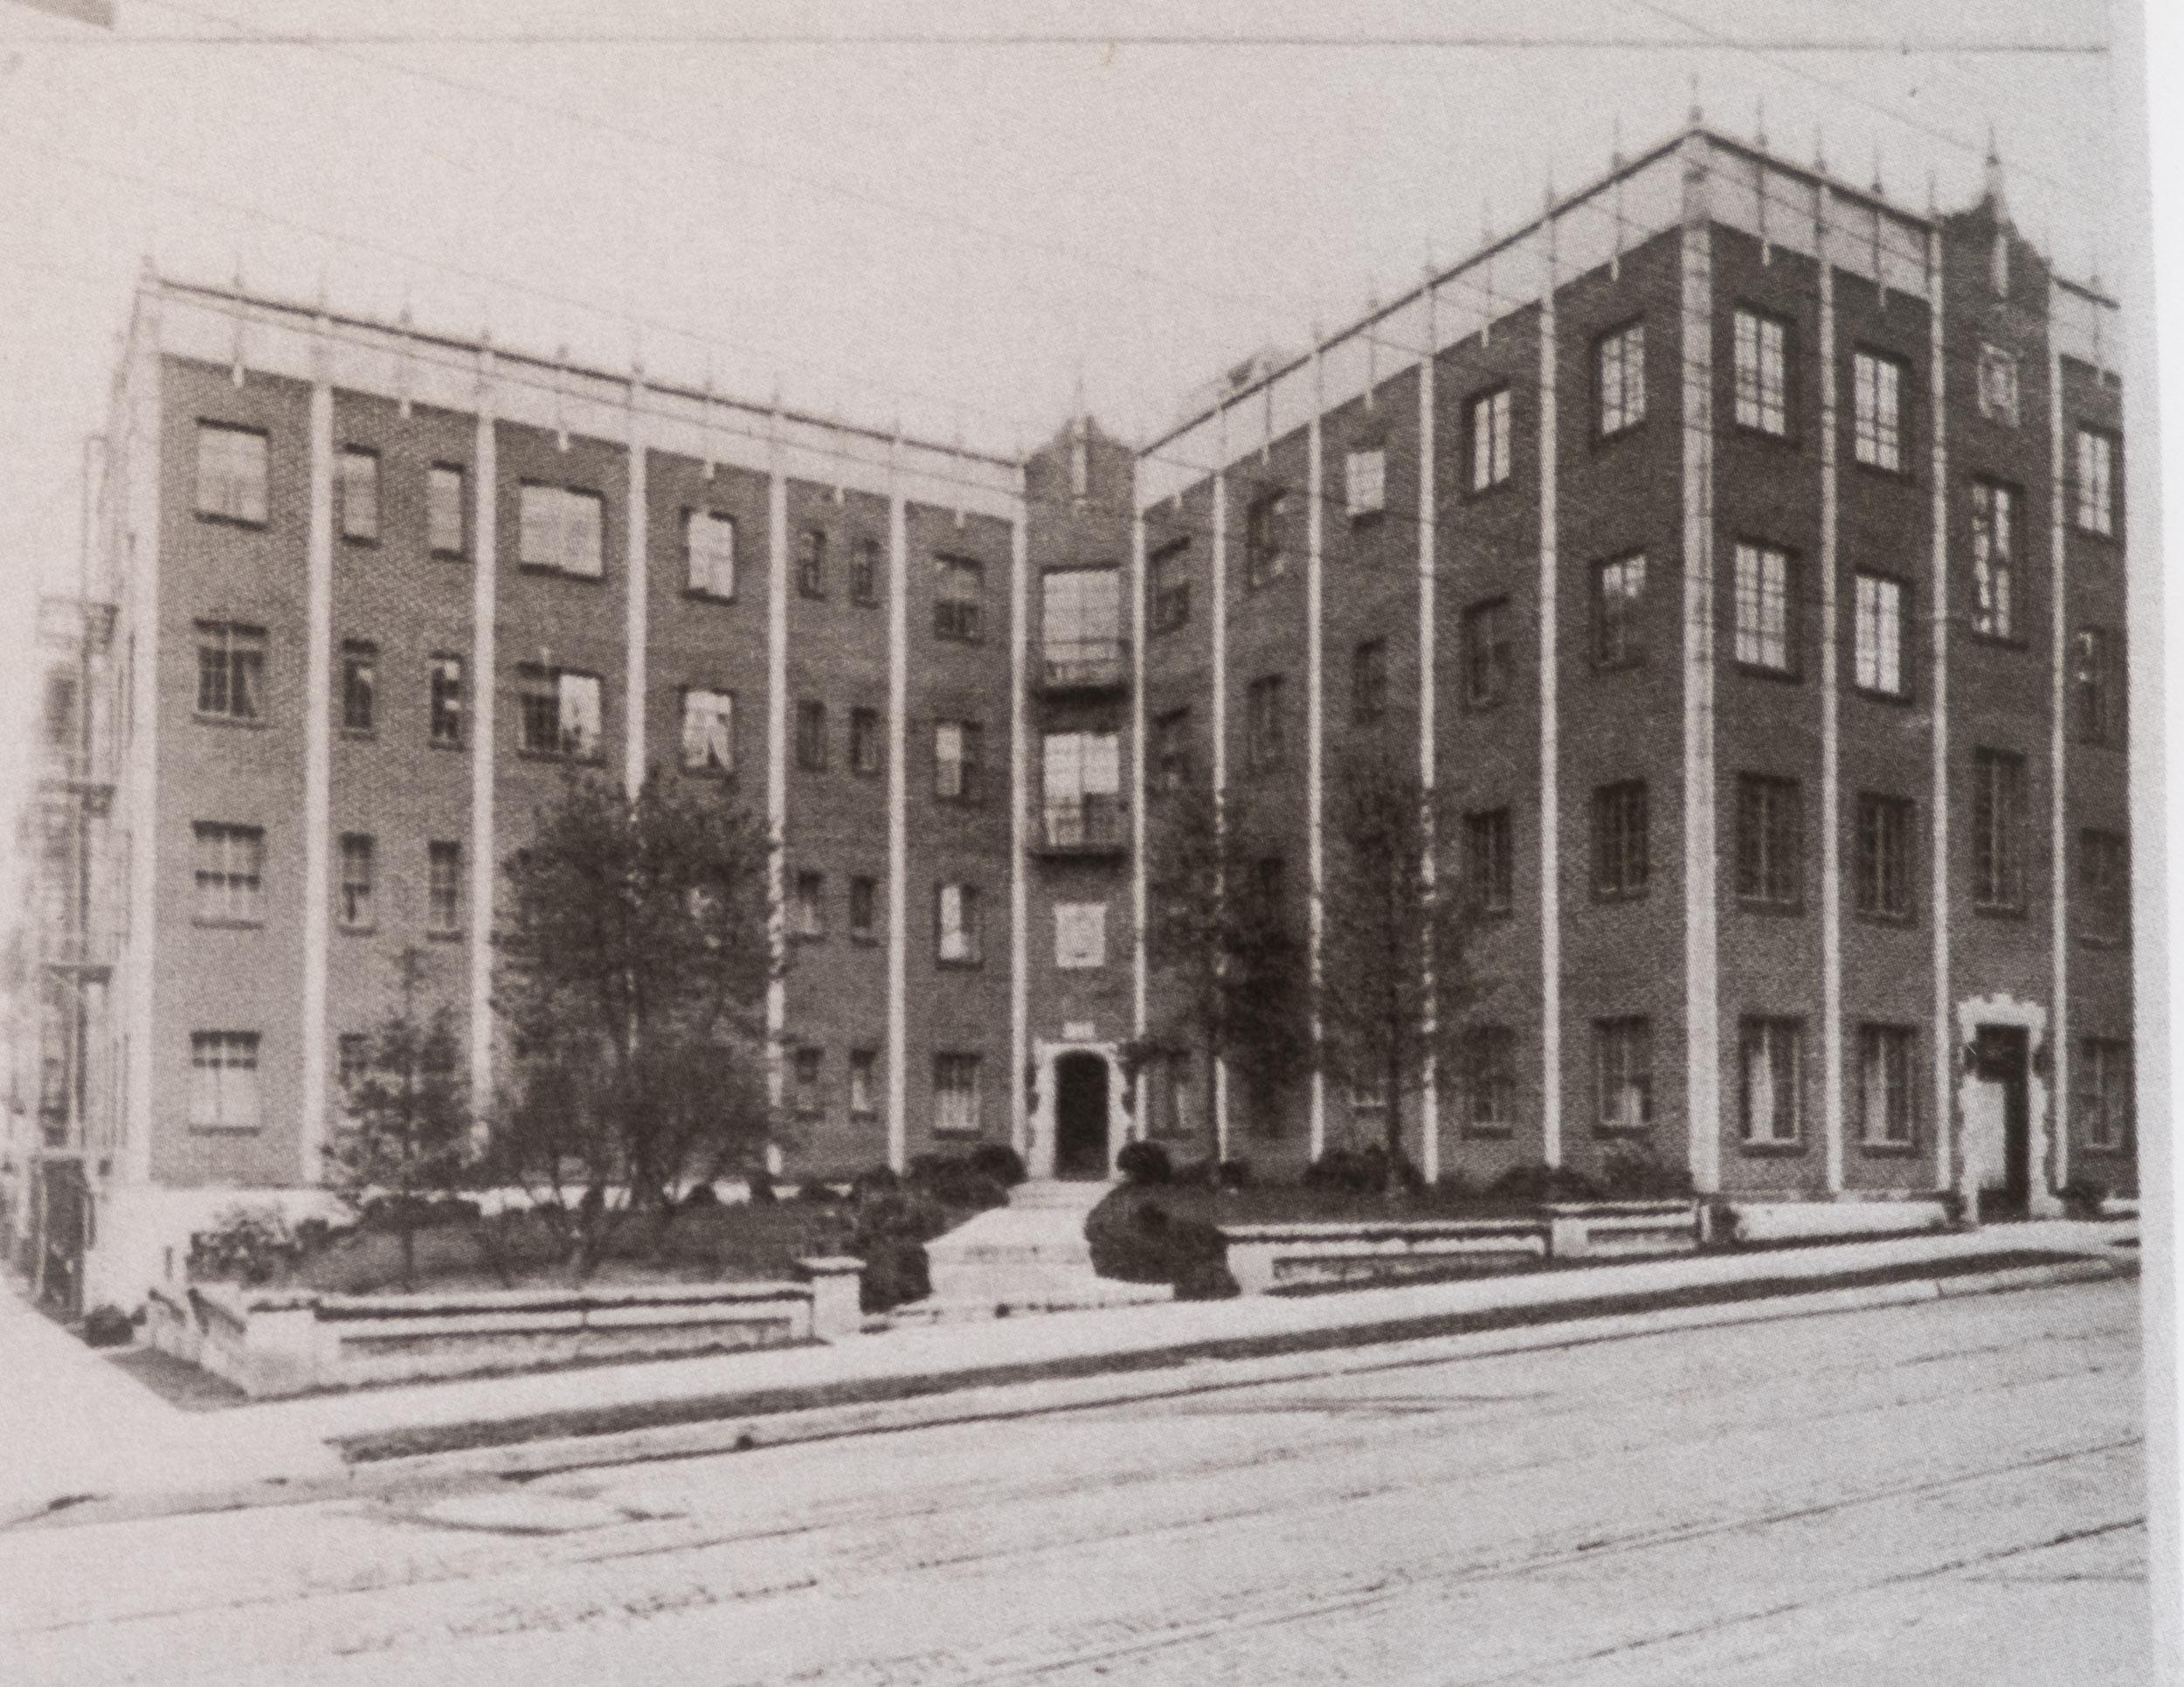 In 1939